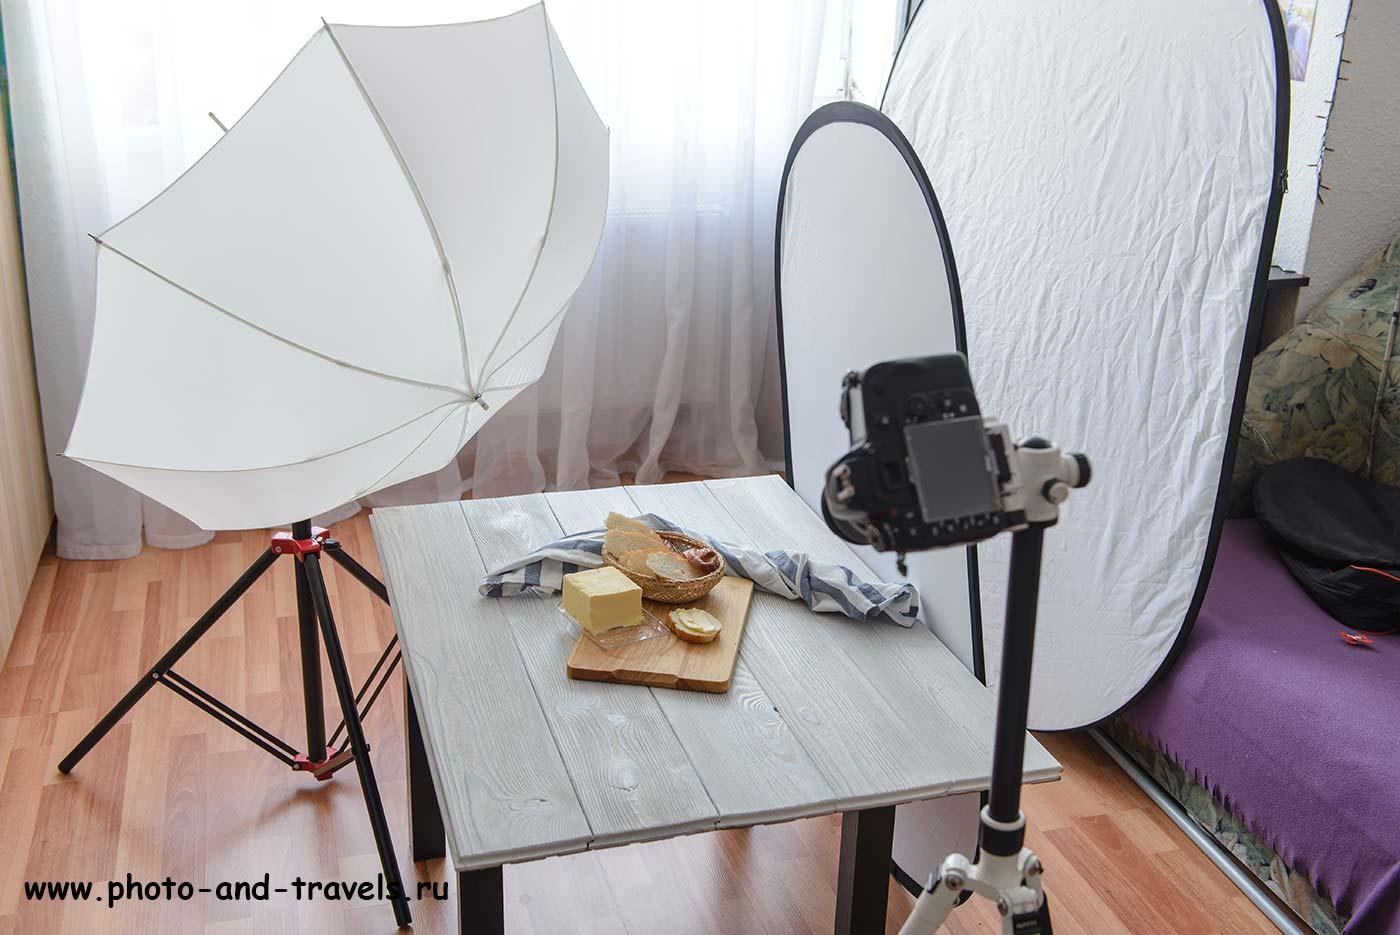 Фотография 17. Стандартная обстановка при съемке еды в условиях недостатка света (24-70, А, 38мм, f5, 1.5сек, ISO 100).